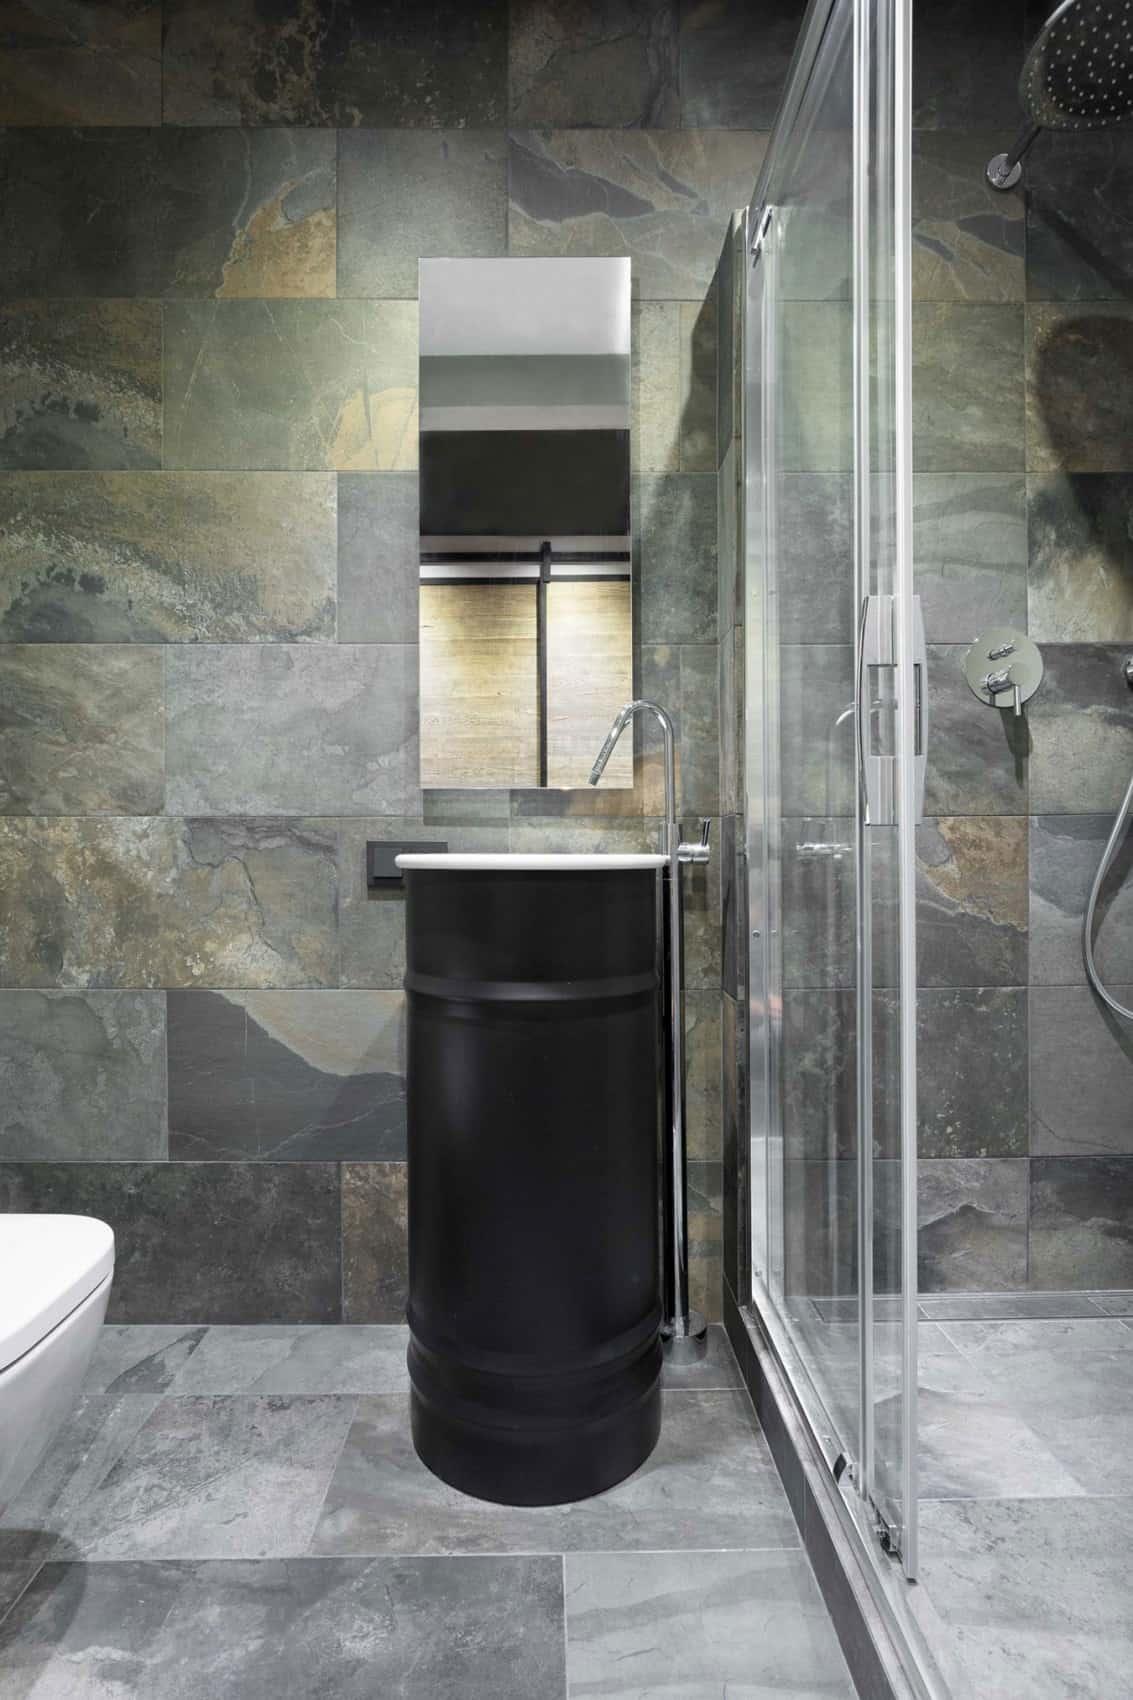 10 Modern Small Bathroom Ideas For Dramatic Design Or